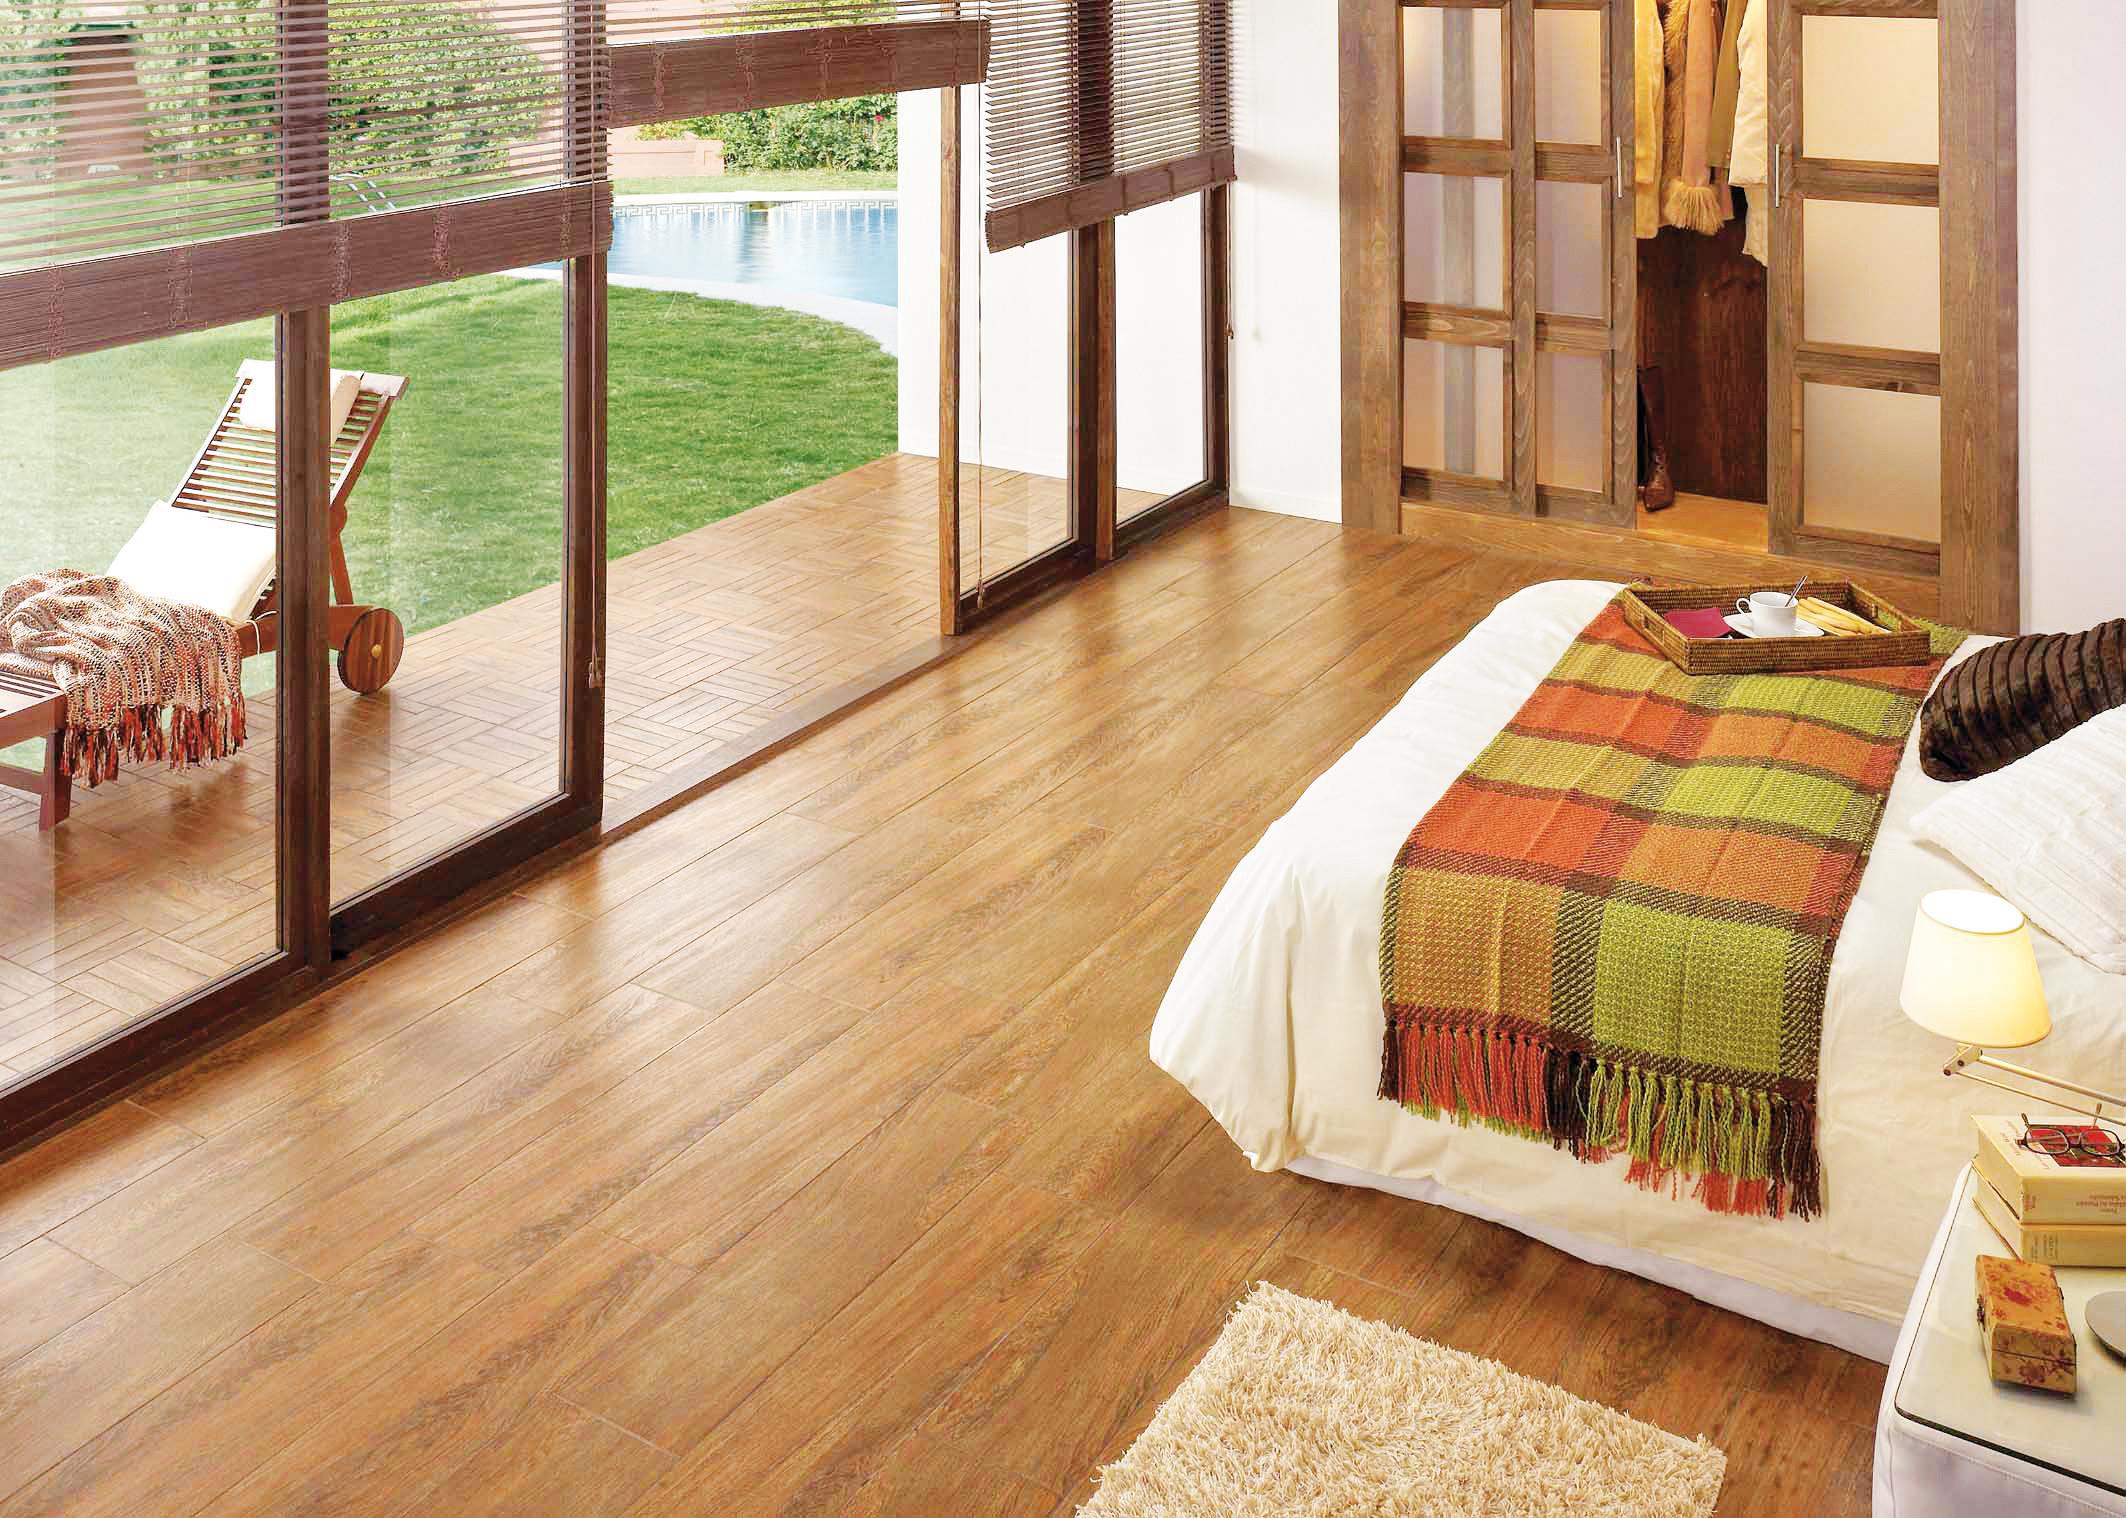 impressionen fliesen kleinschmidt. Black Bedroom Furniture Sets. Home Design Ideas